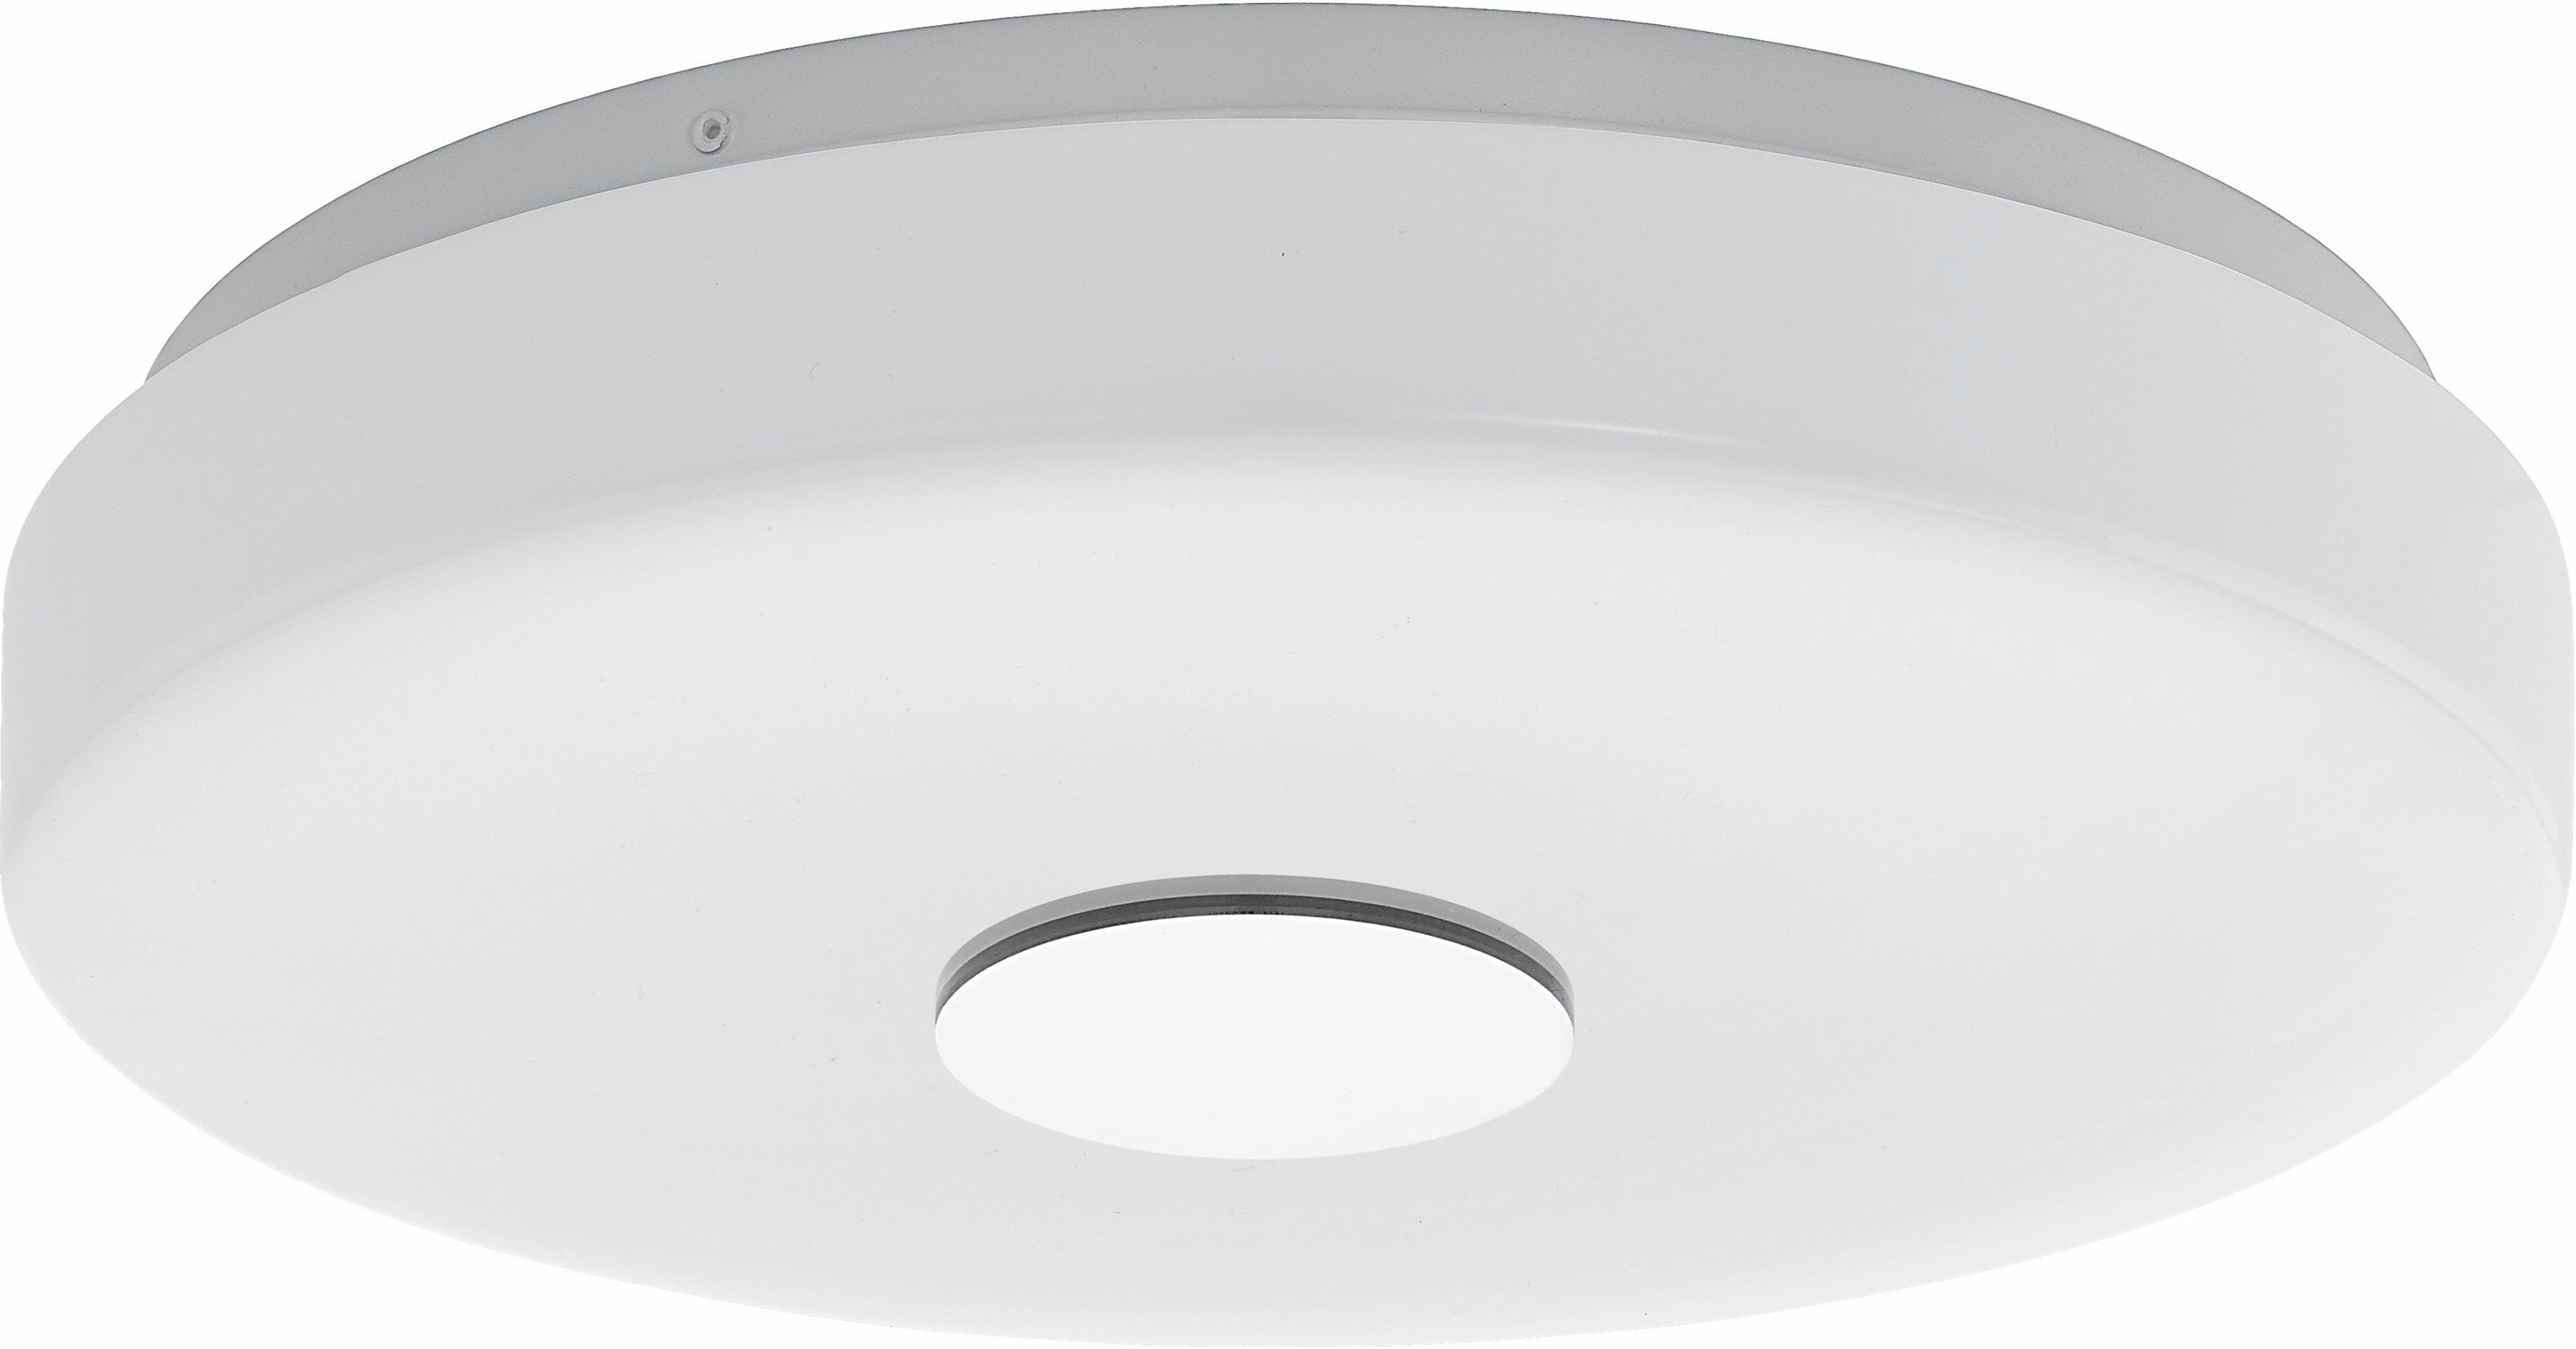 EGLO,LED Deckenleuchte BERGAMO-C